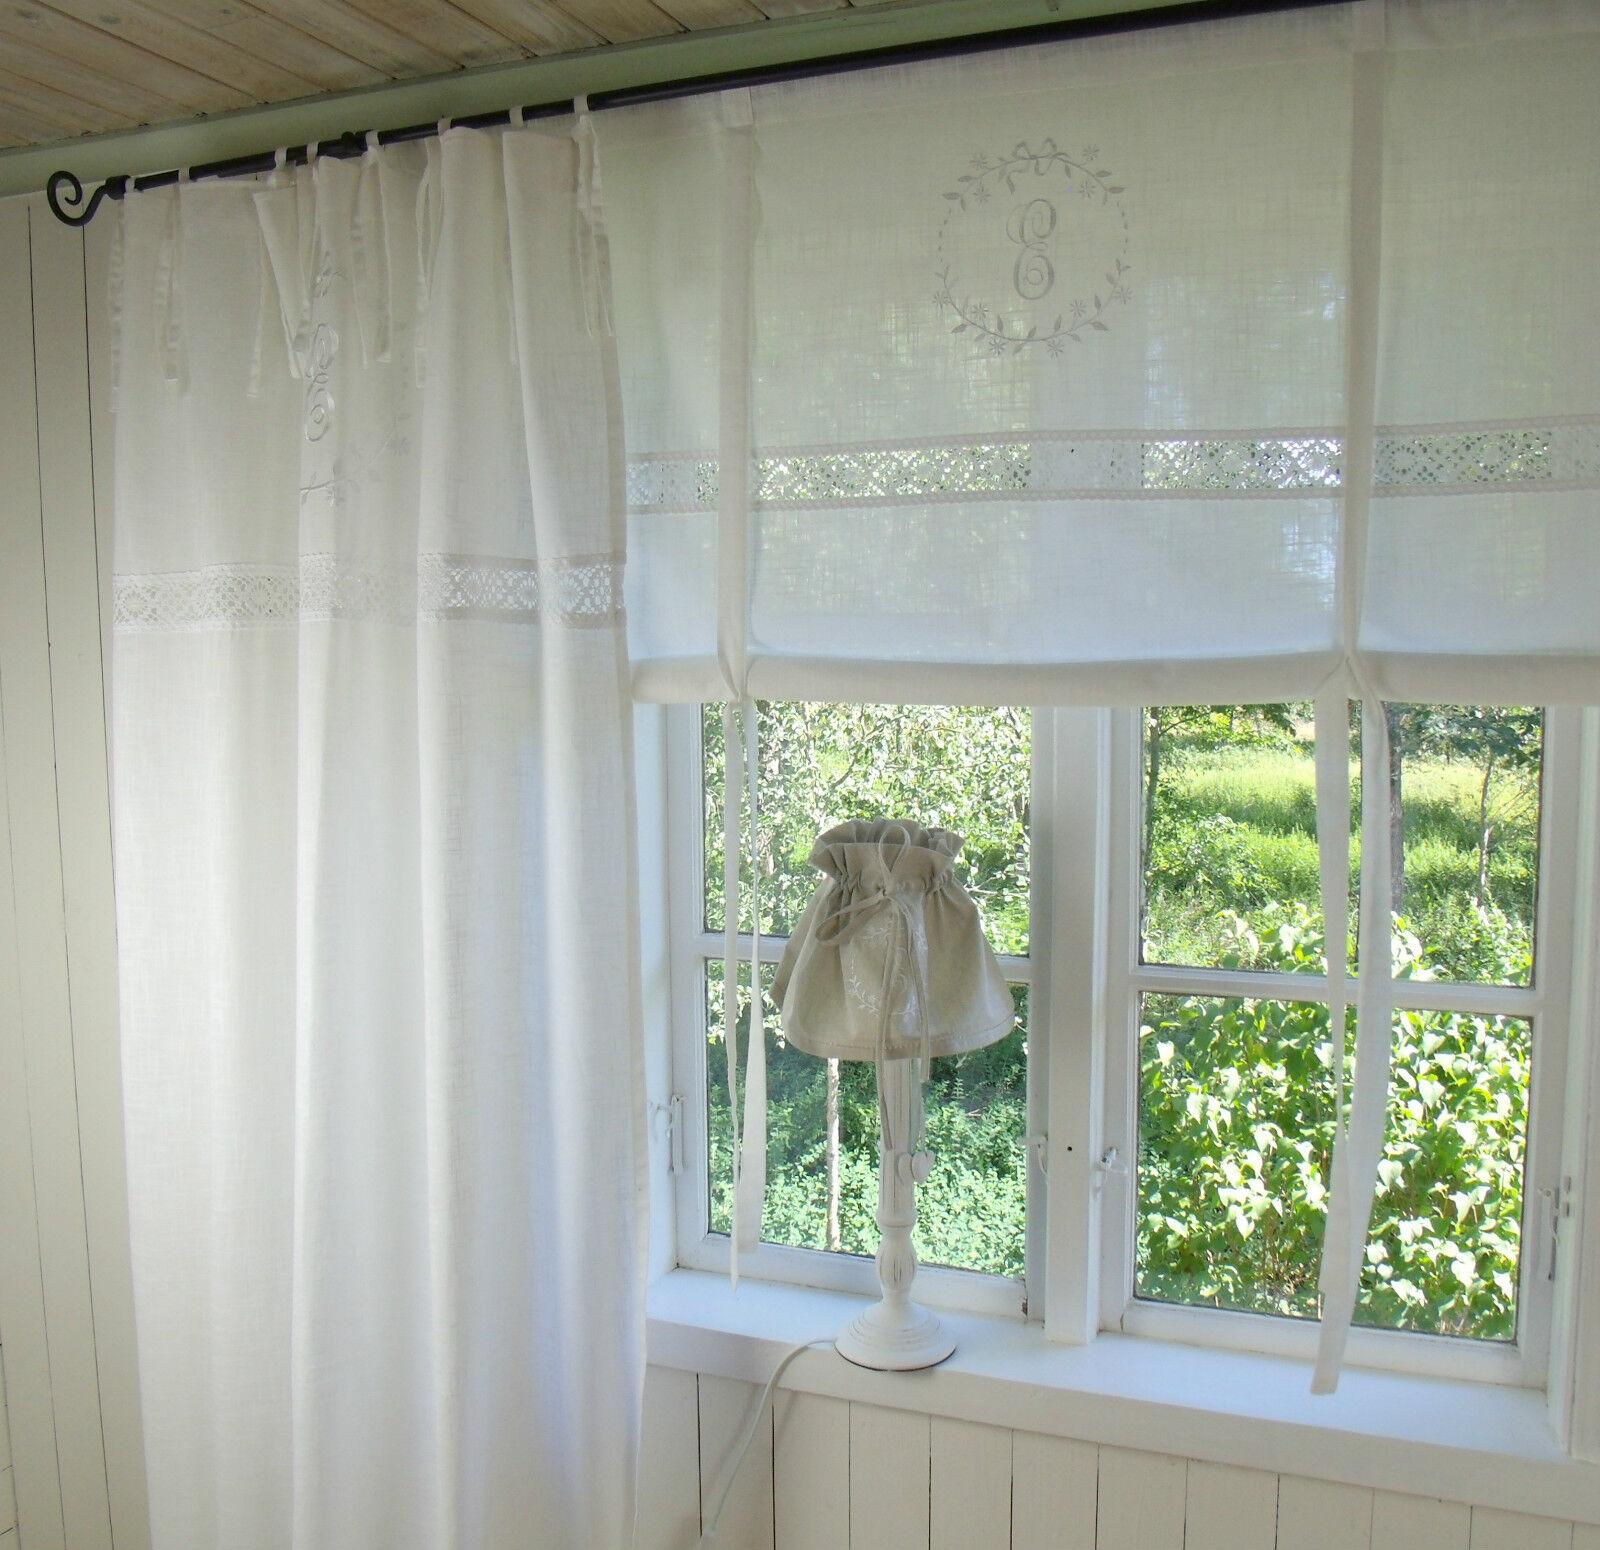 vorhang crystal weiss schlaufen gardine 120x240 2 st ck lillabelle shabby vintag eur 89 95. Black Bedroom Furniture Sets. Home Design Ideas